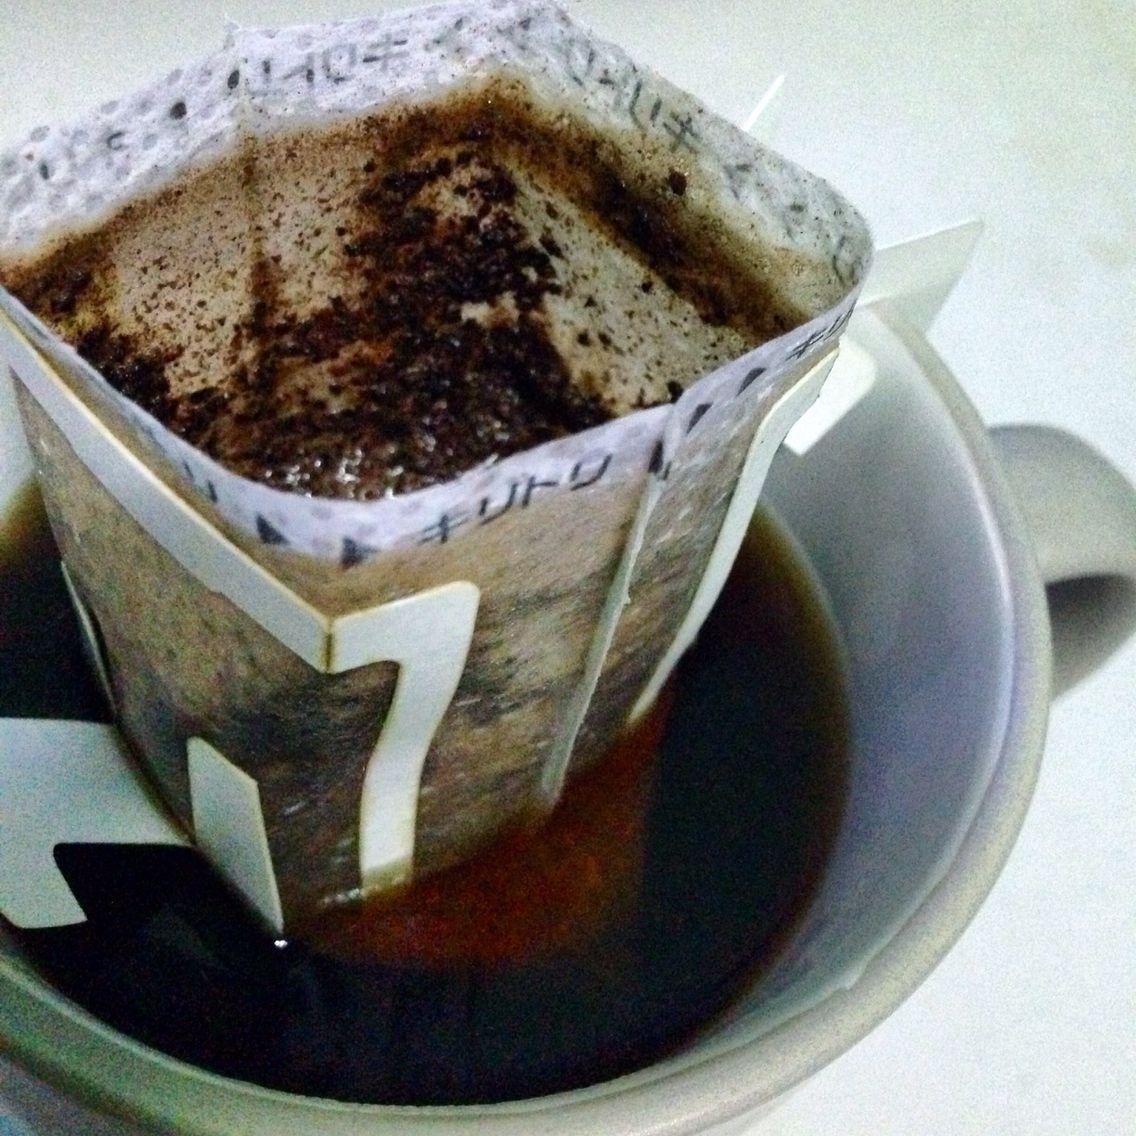 japanese coffee ucc